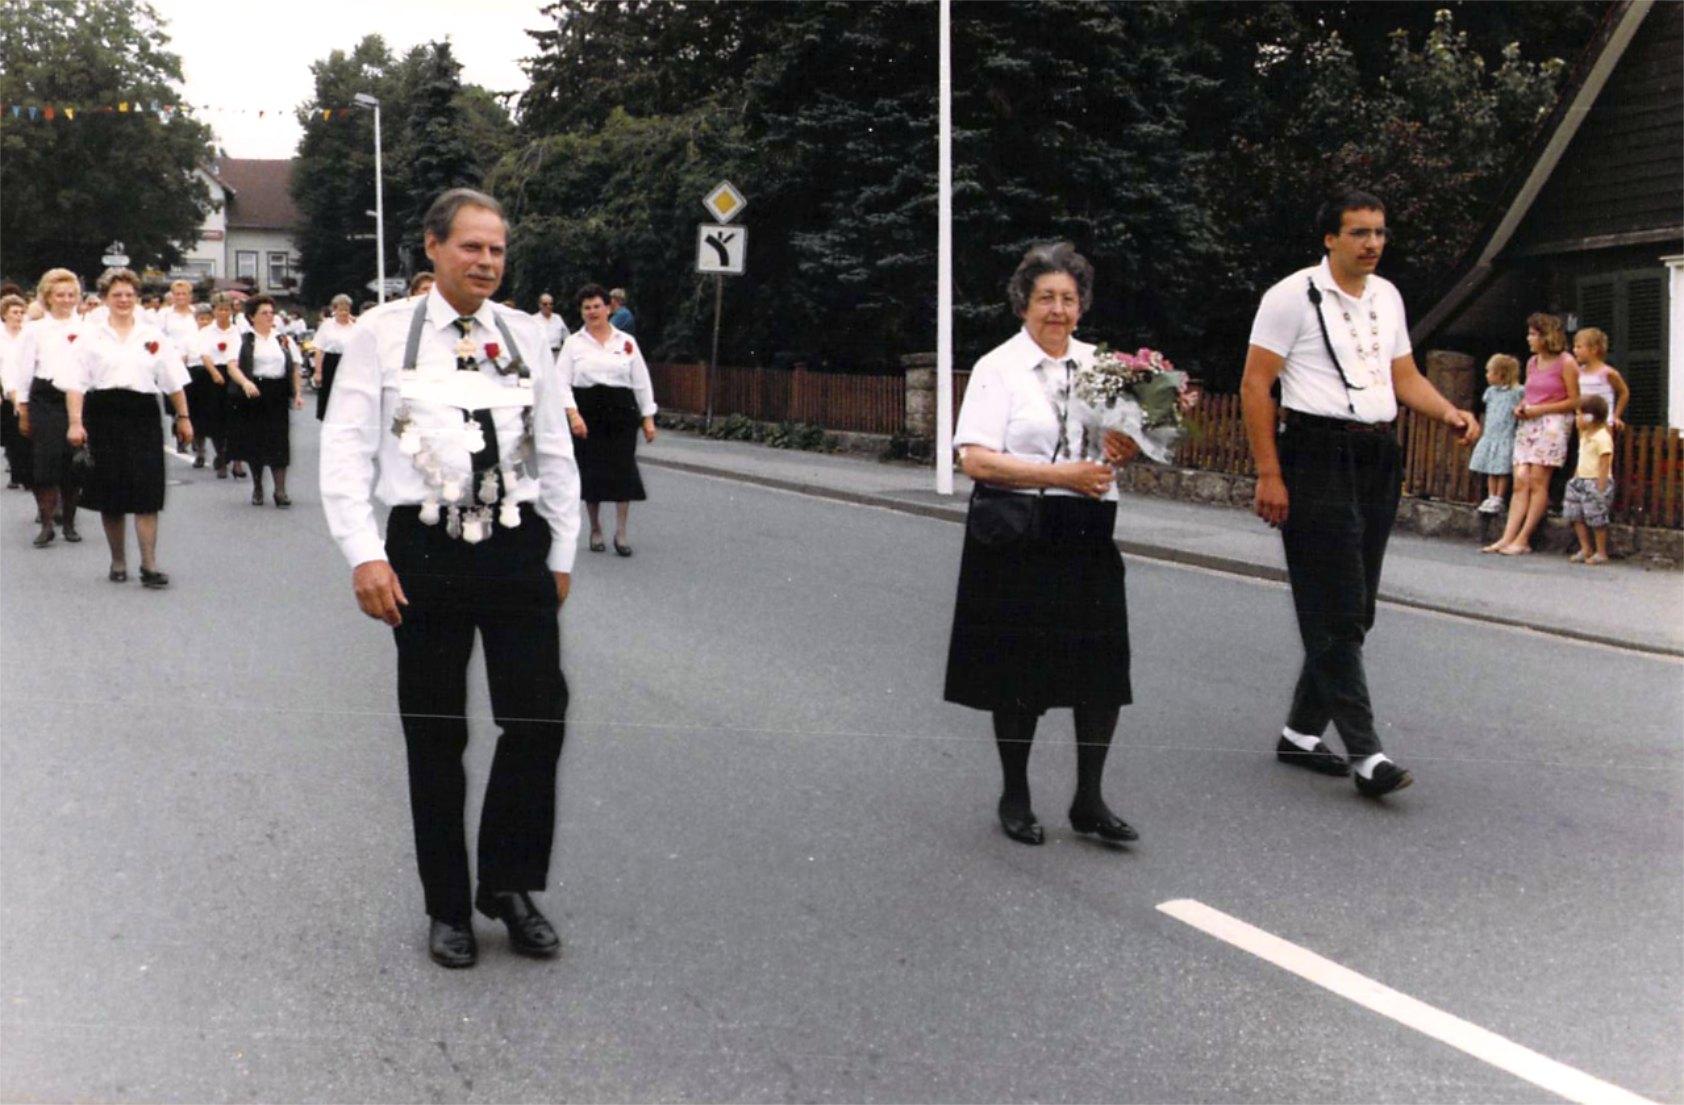 Schützenkönige 1989